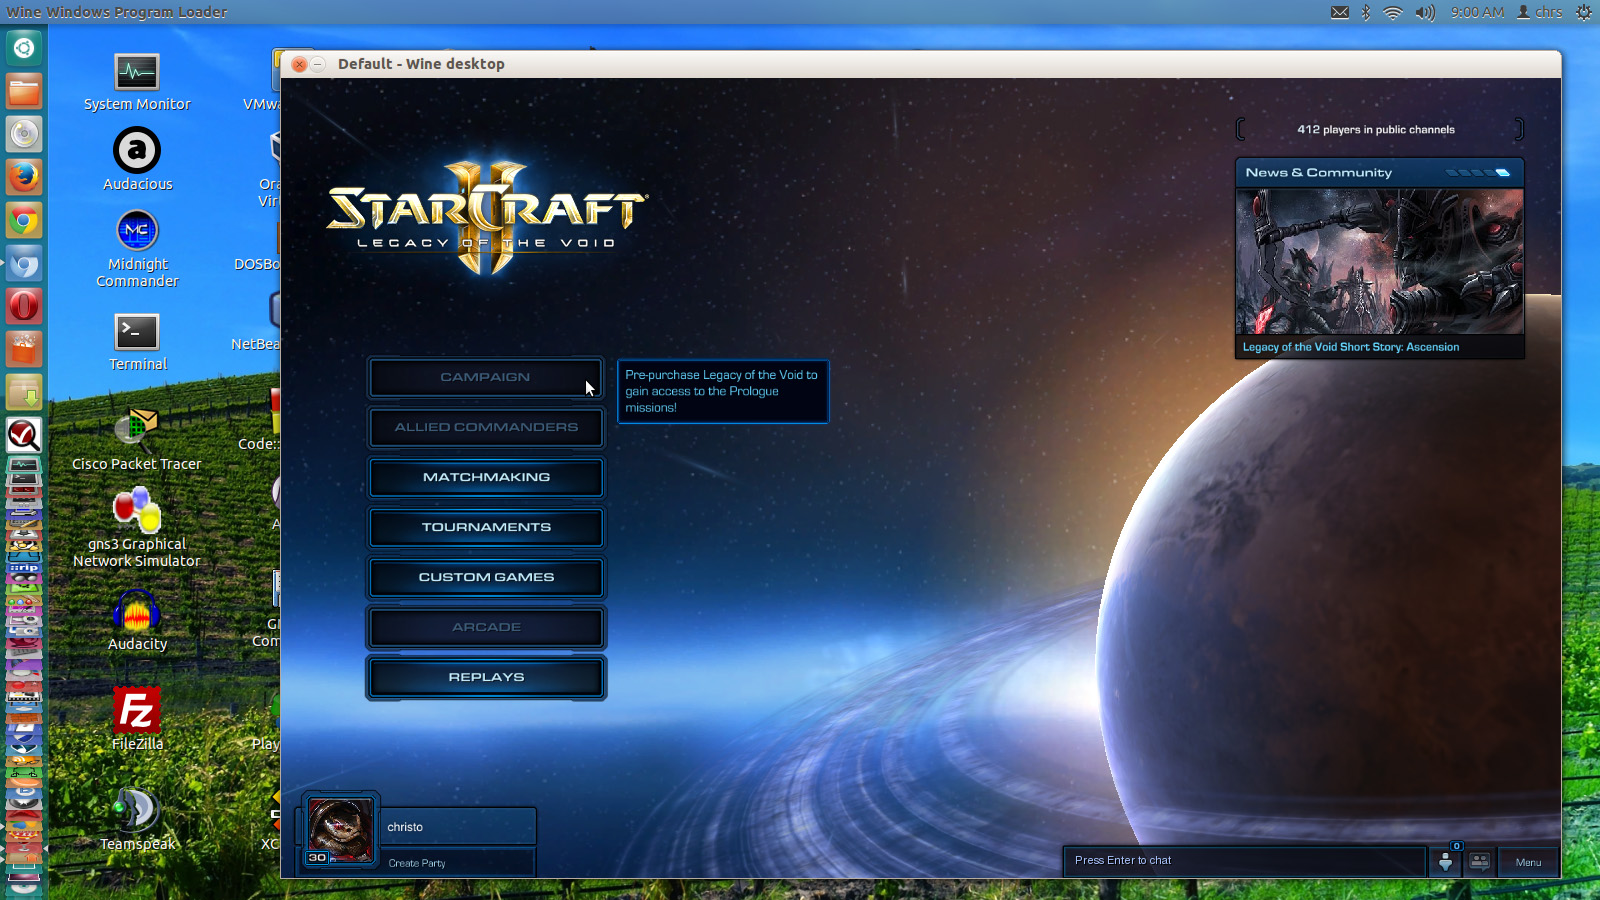 starcraft_2_linux_12.jpg